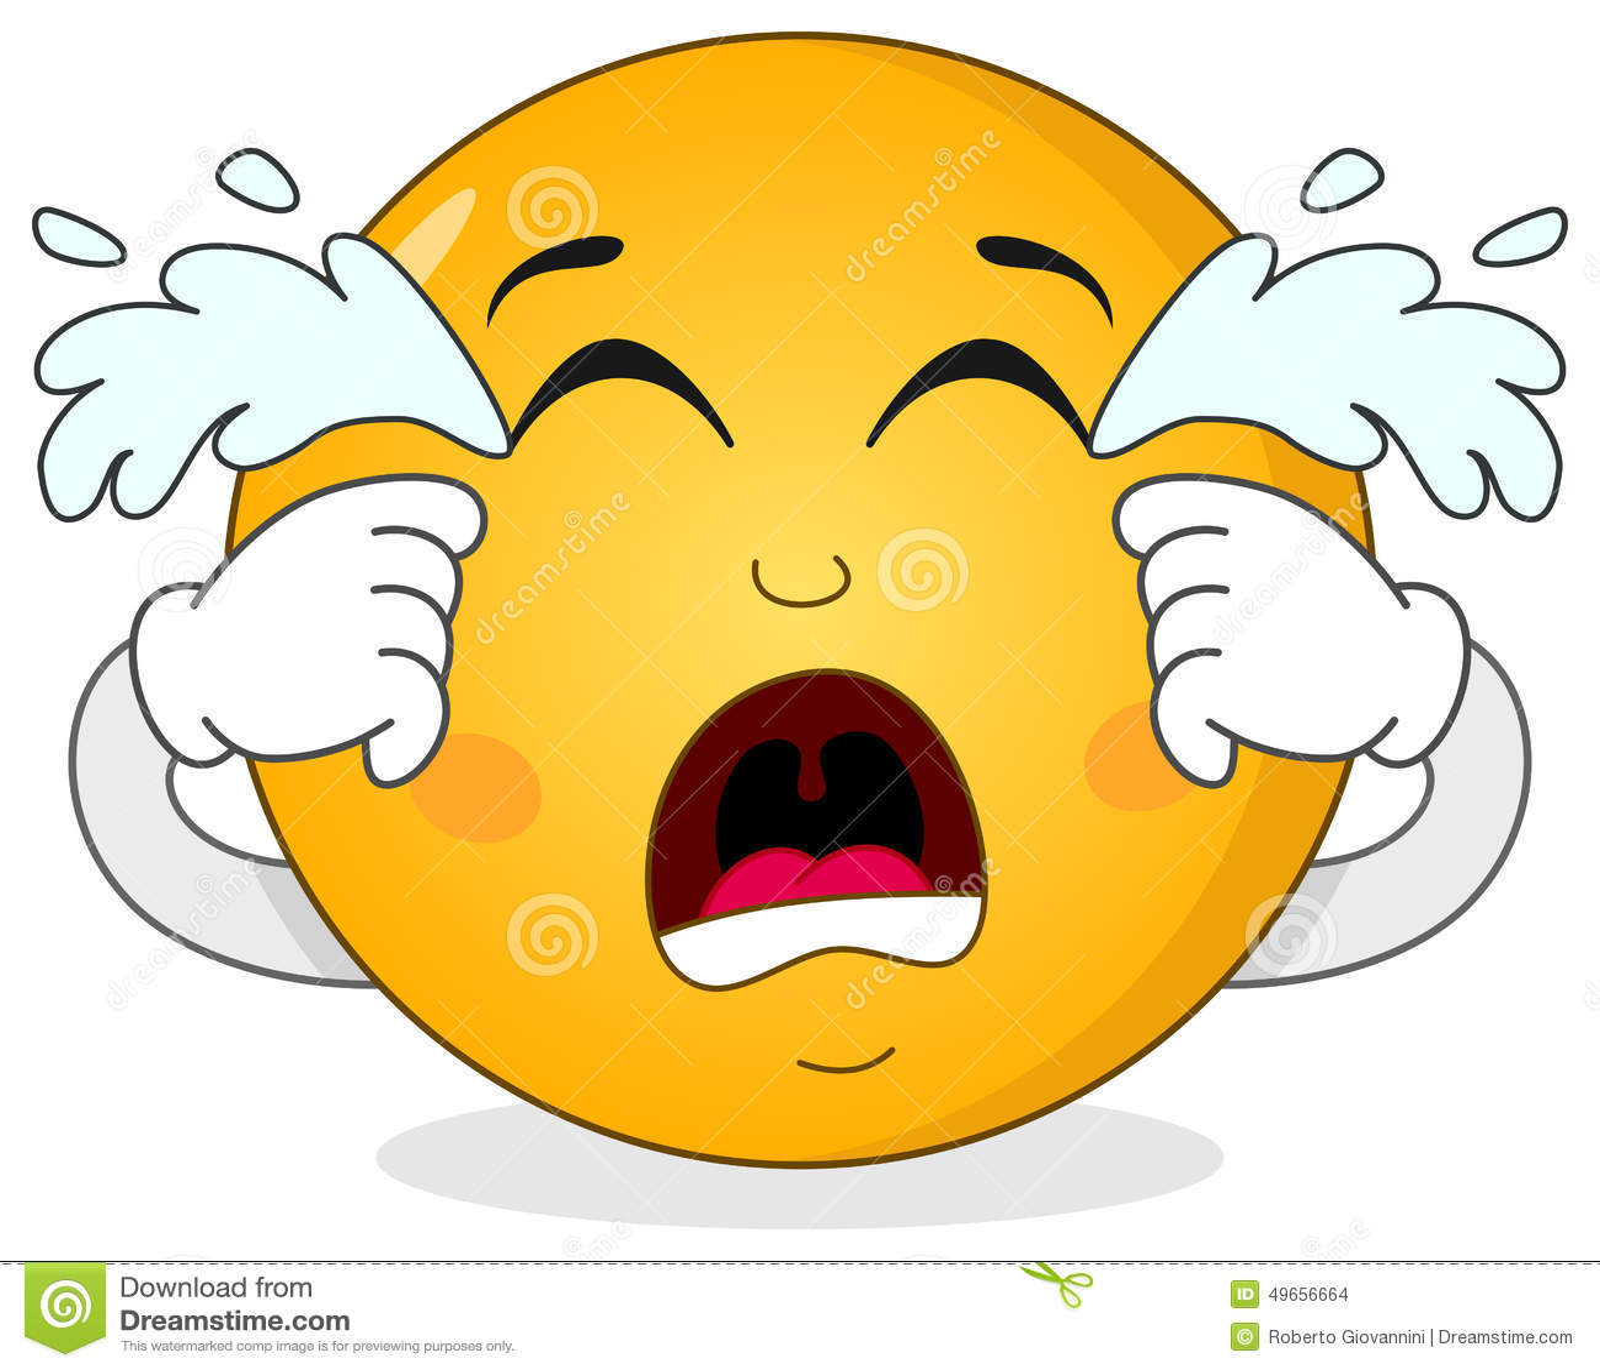 Cartoon Characters Crying : Sad crying smiley emoticon character stock vector image